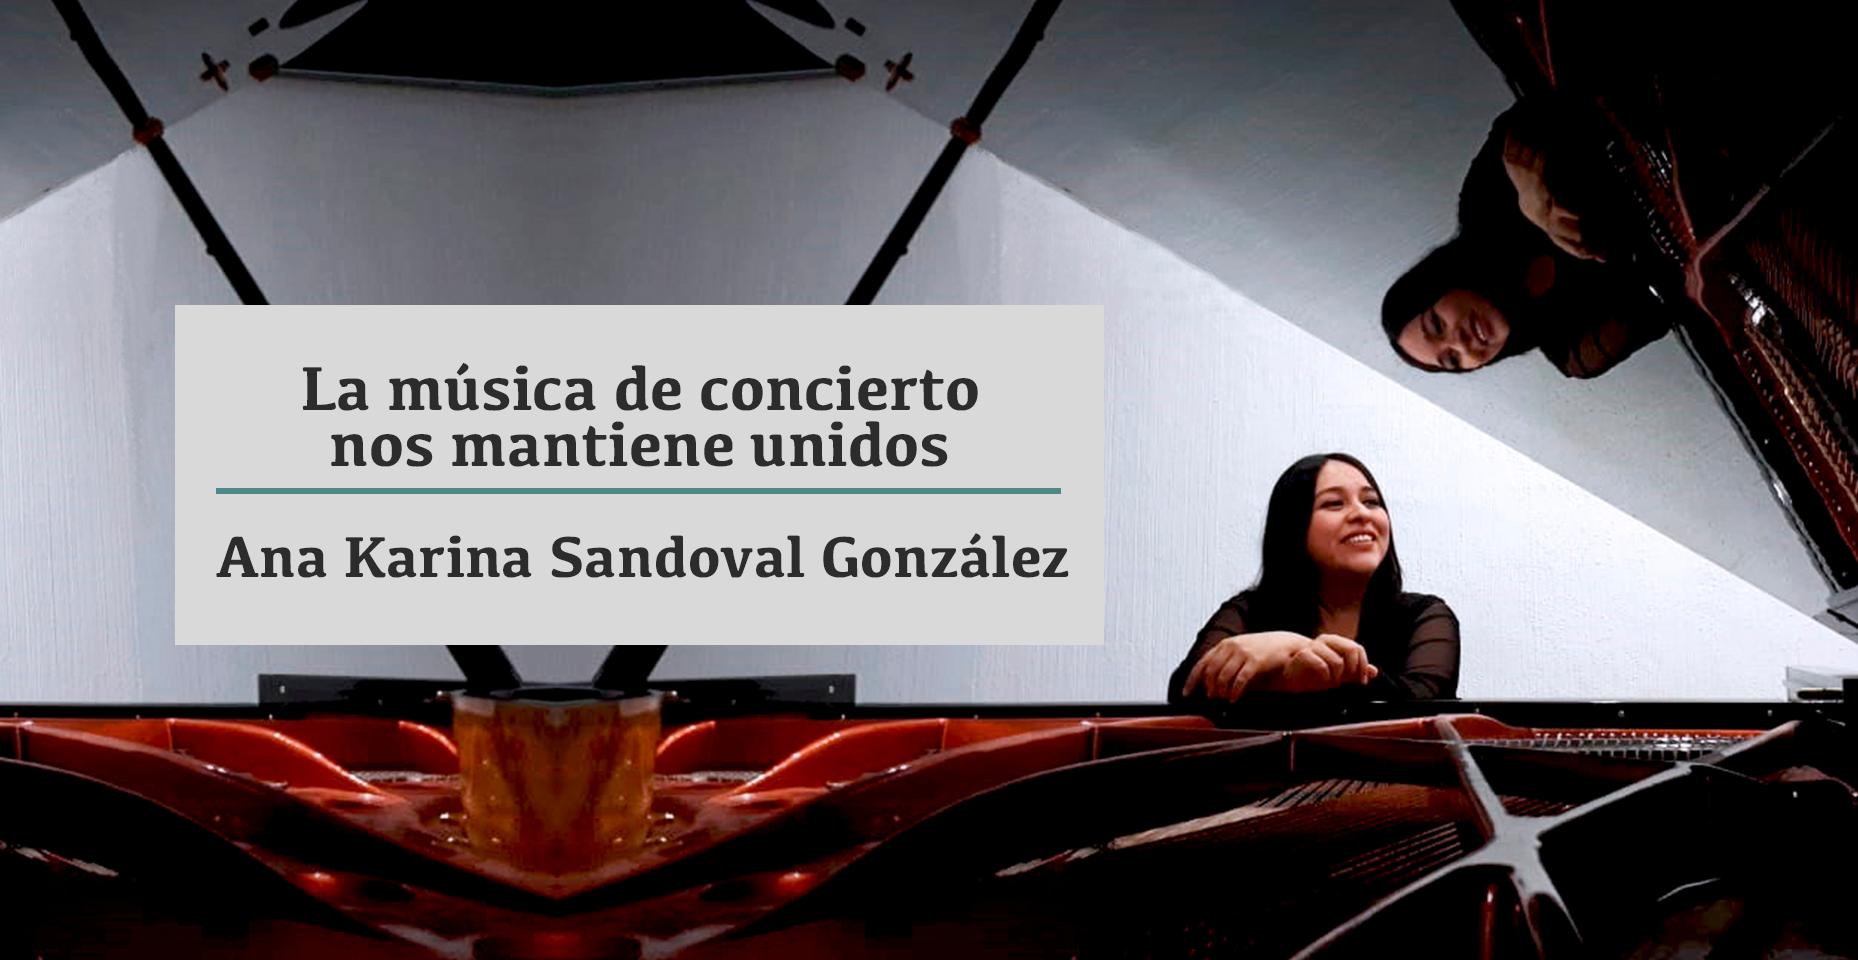 Ana Karina Sandoval González